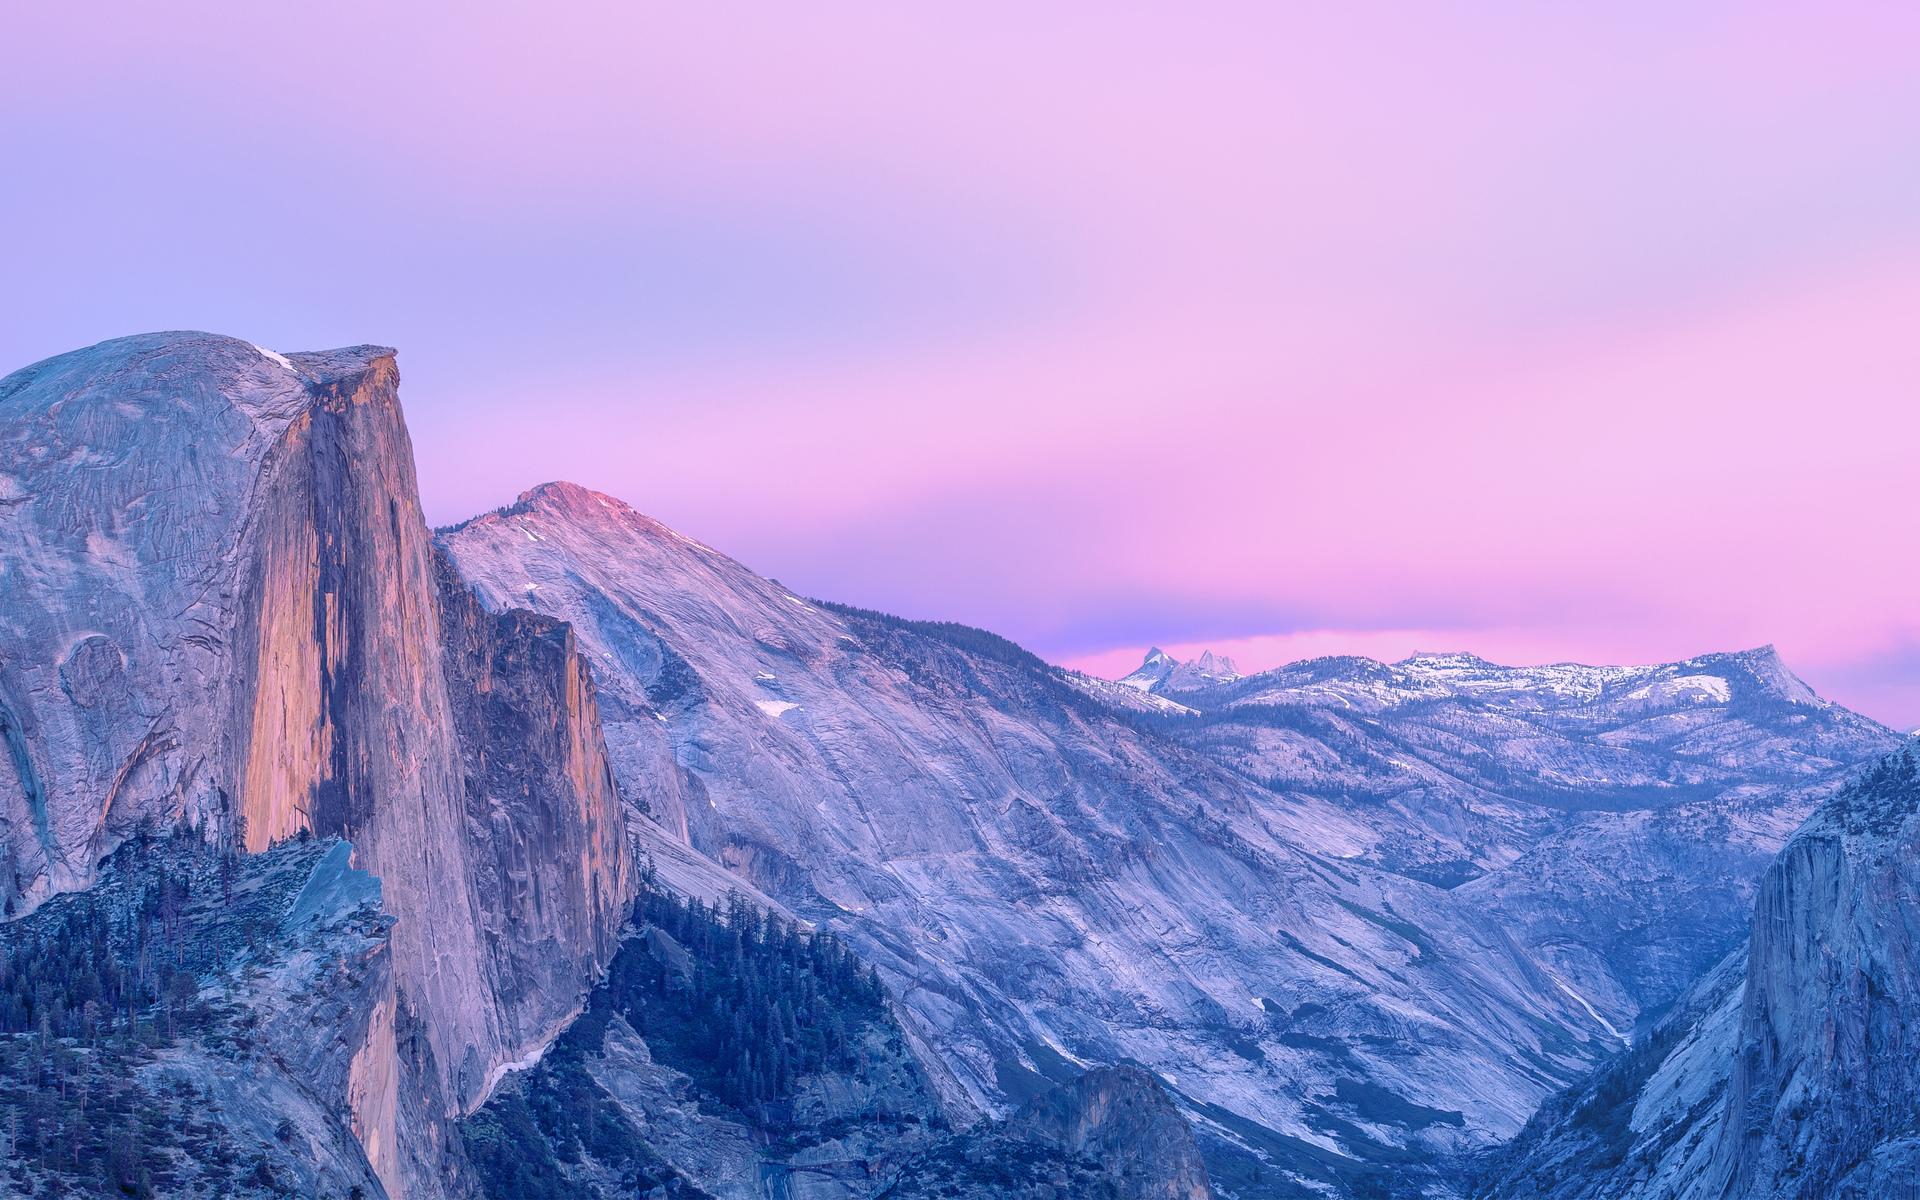 Yosemite National Park (1920x1200)